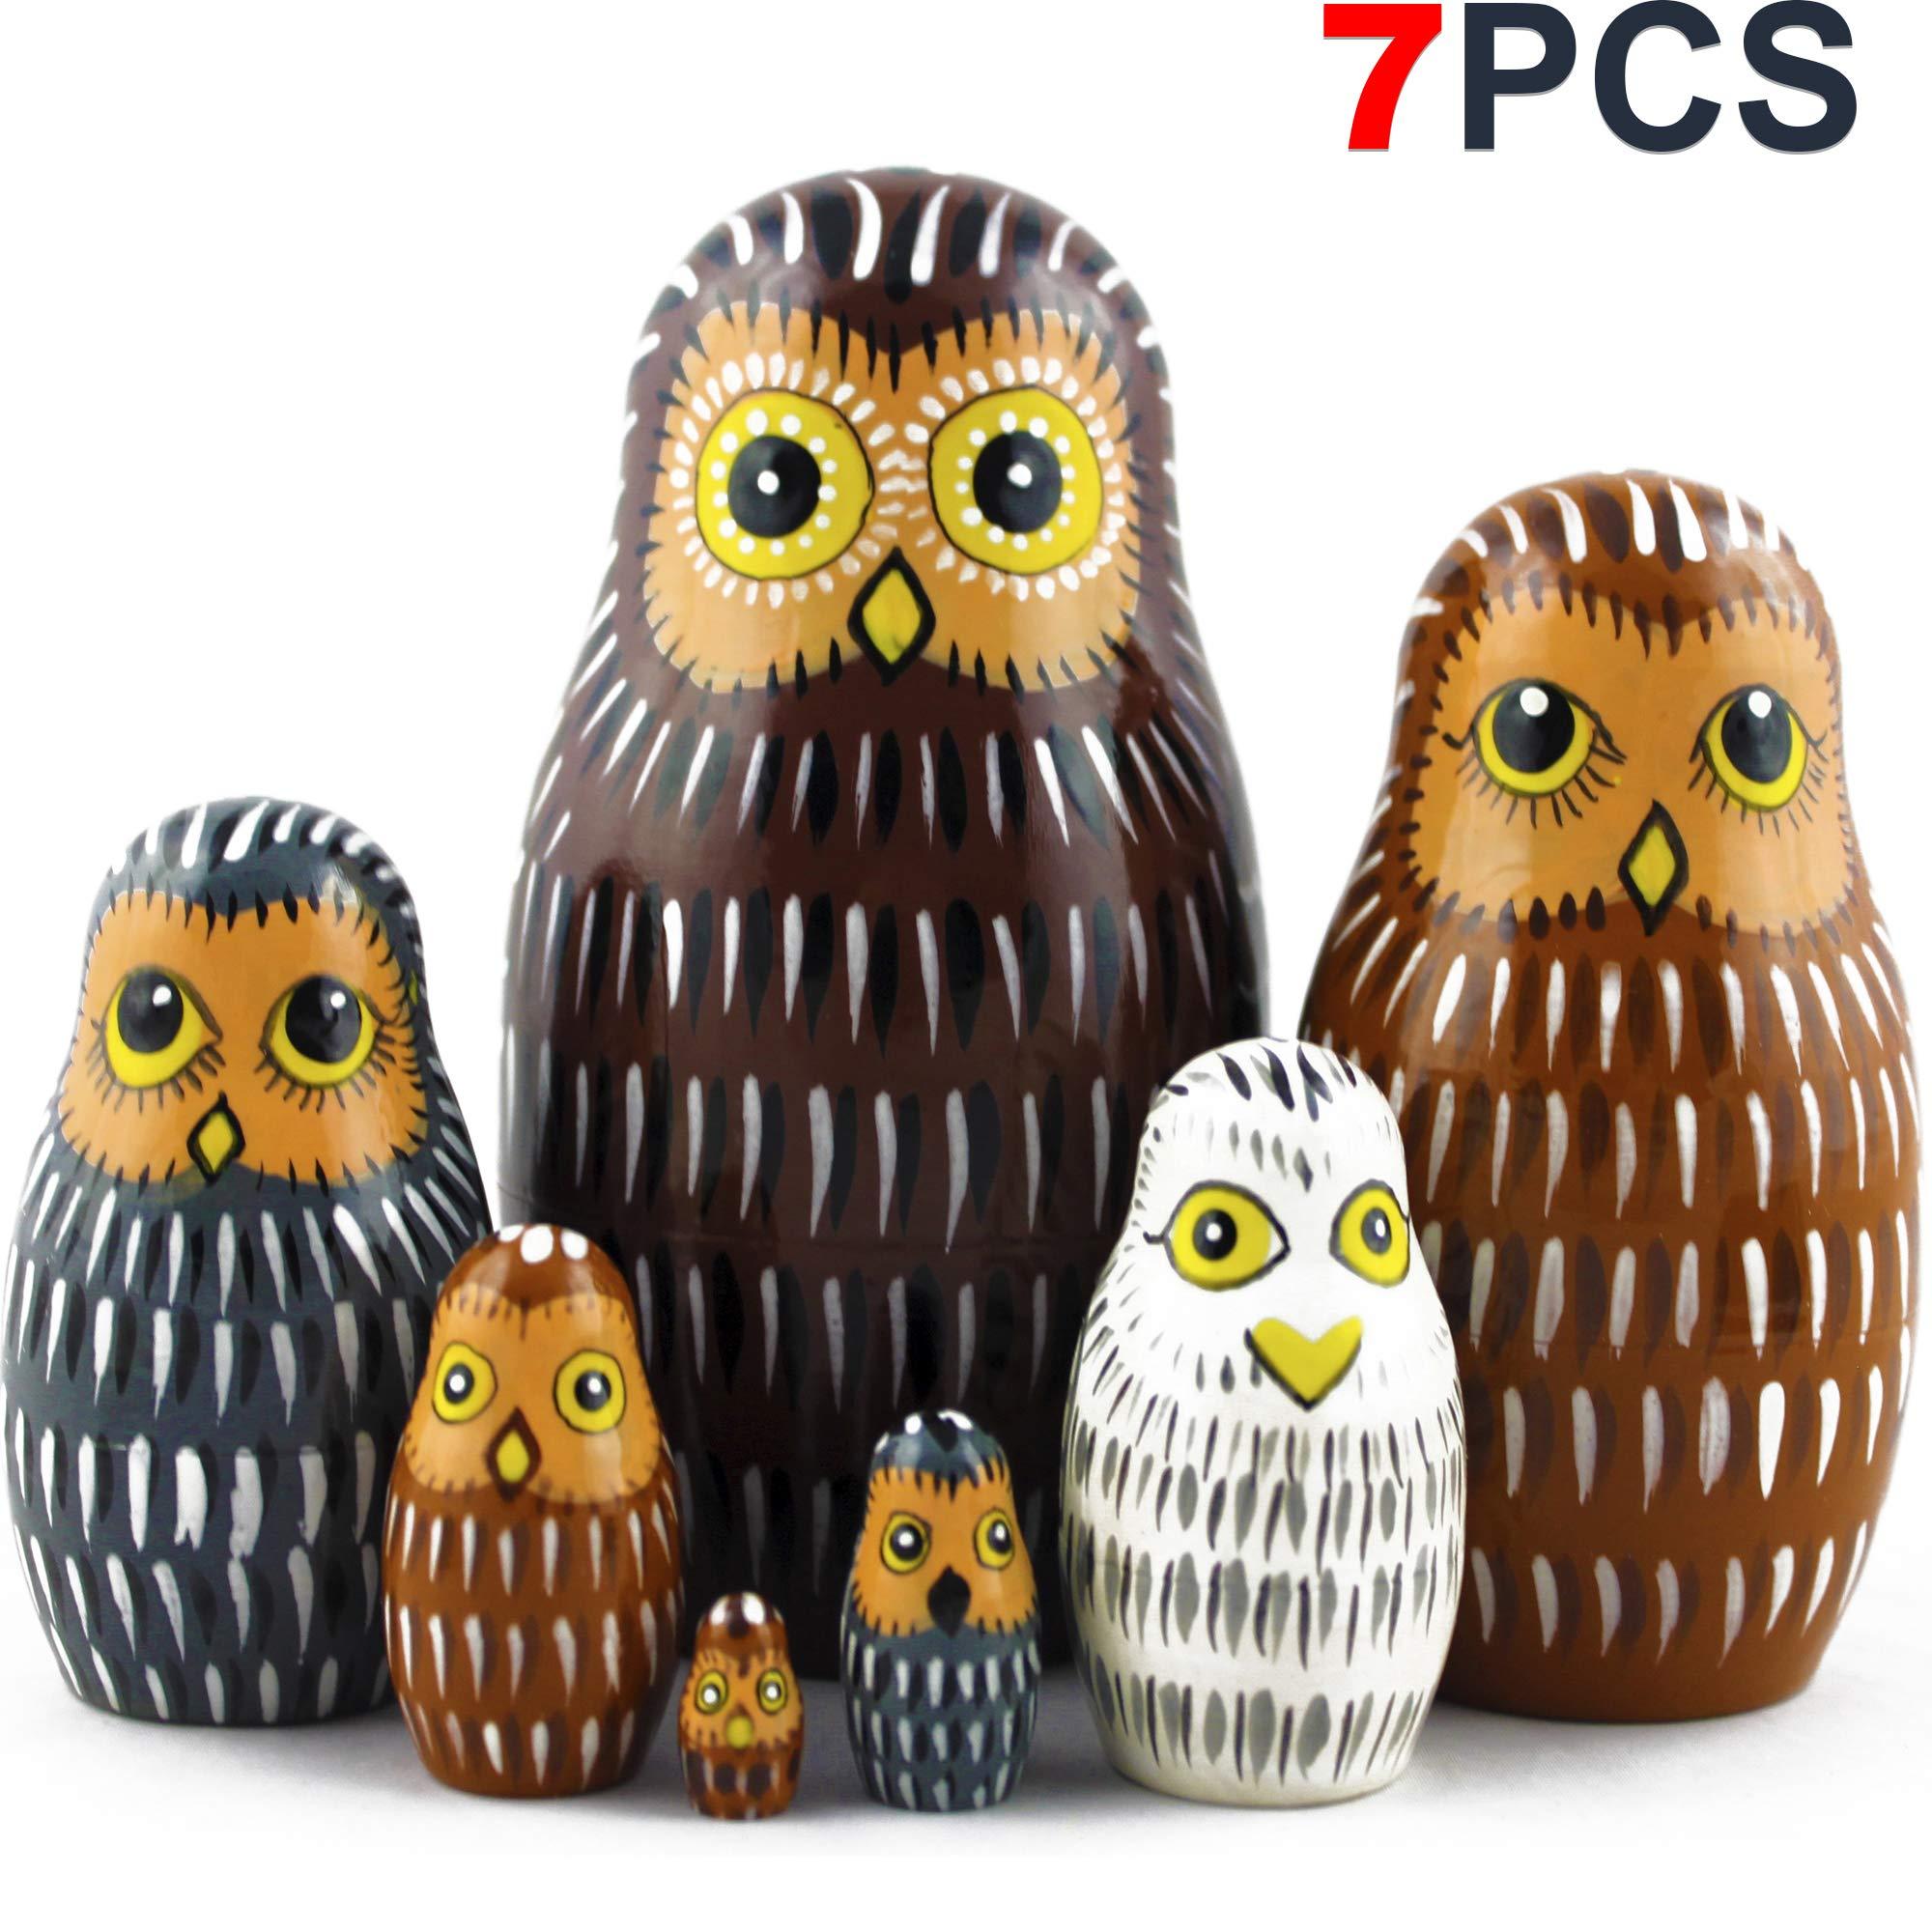 Owl Nesting Dolls - Owl Decor - Owl Gifts - Owl Toy - Matryoshka set 7 dolls by MATRYOSHKA&HANDICRAFT